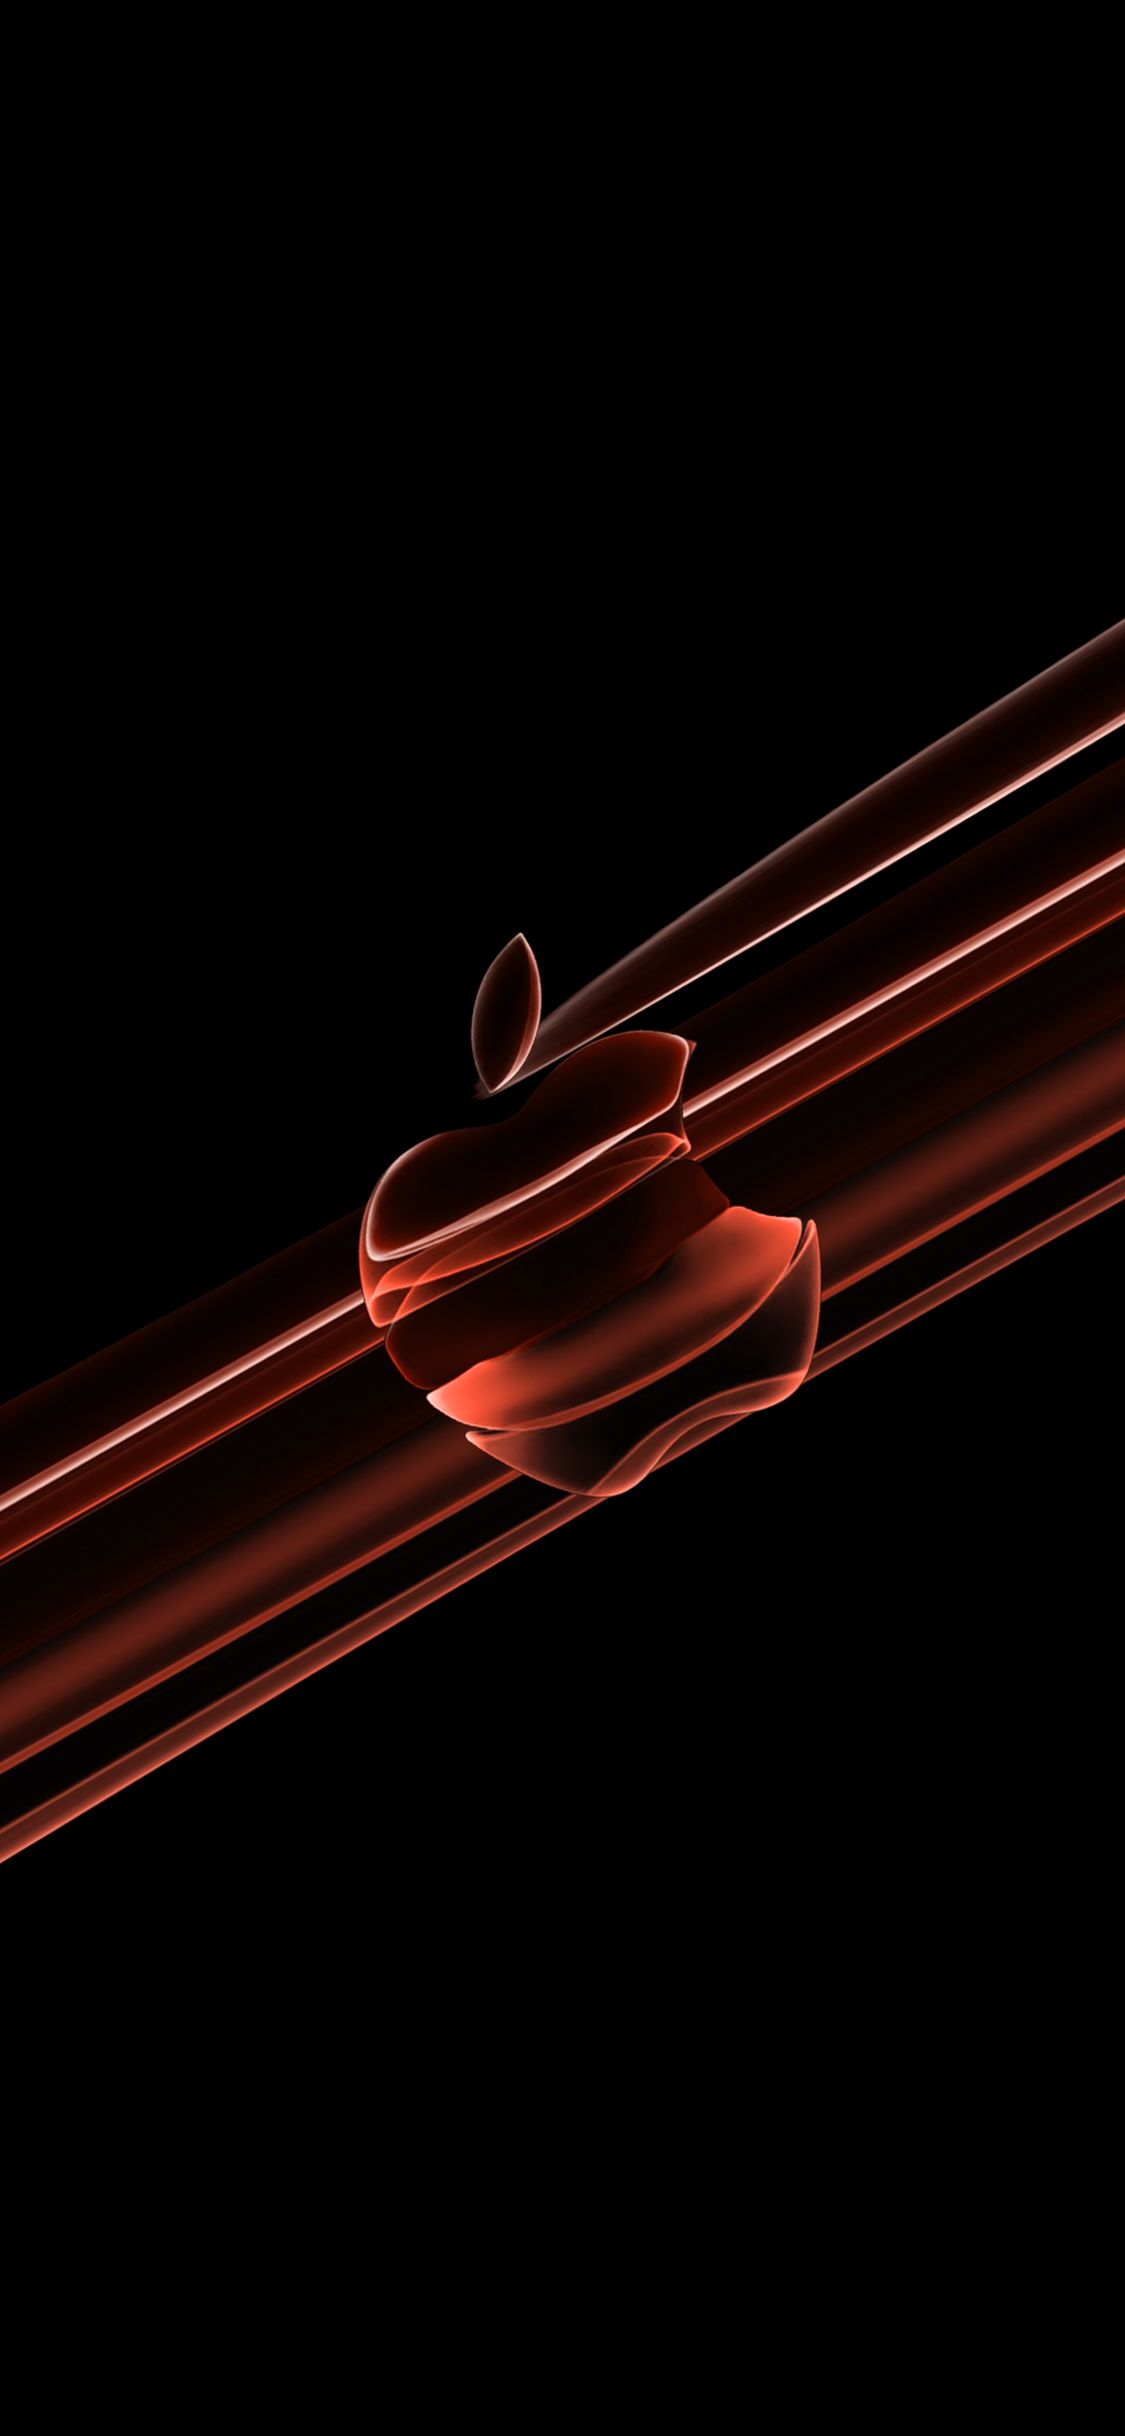 iphonewallpaper apple applelogo IOS13 coral darkmode